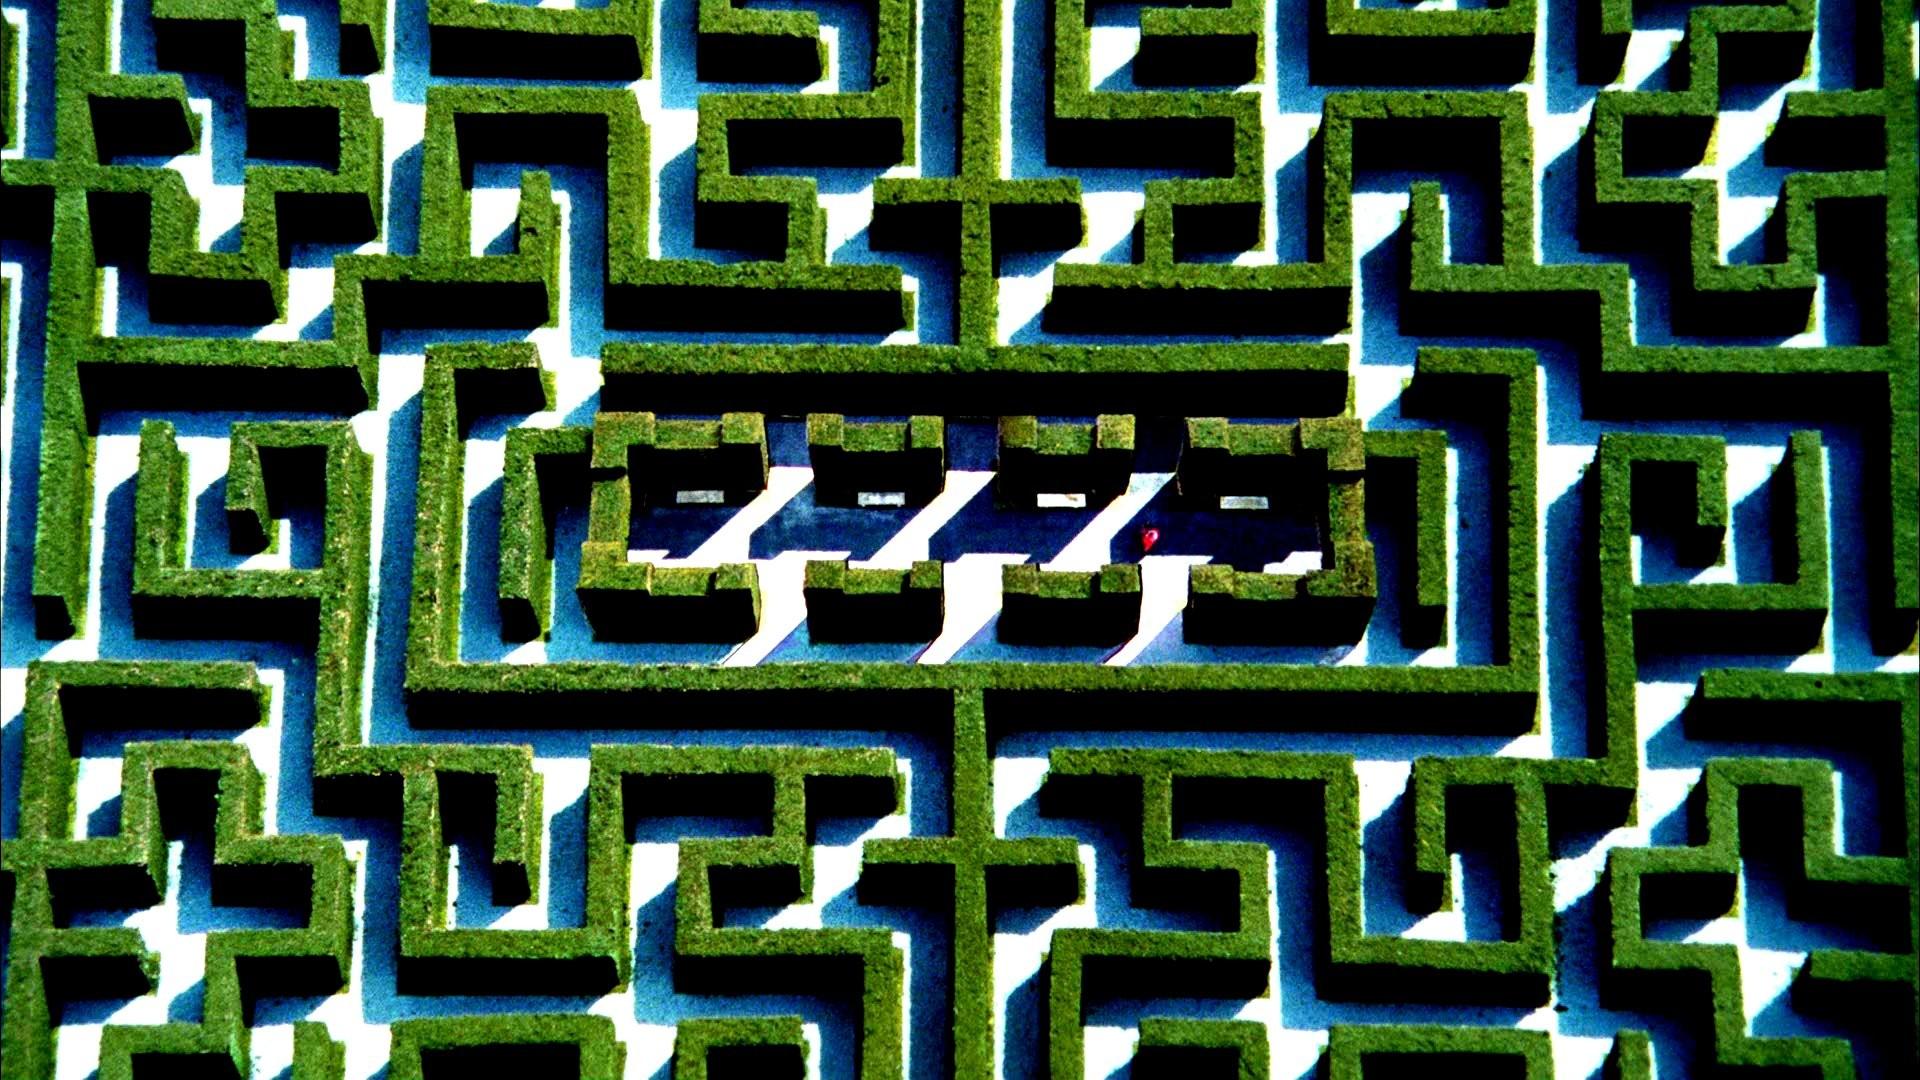 THE SHINING horror thriller dark movie film classic psychedelic maze  pattern garden wallpaper | | 253378 | WallpaperUP